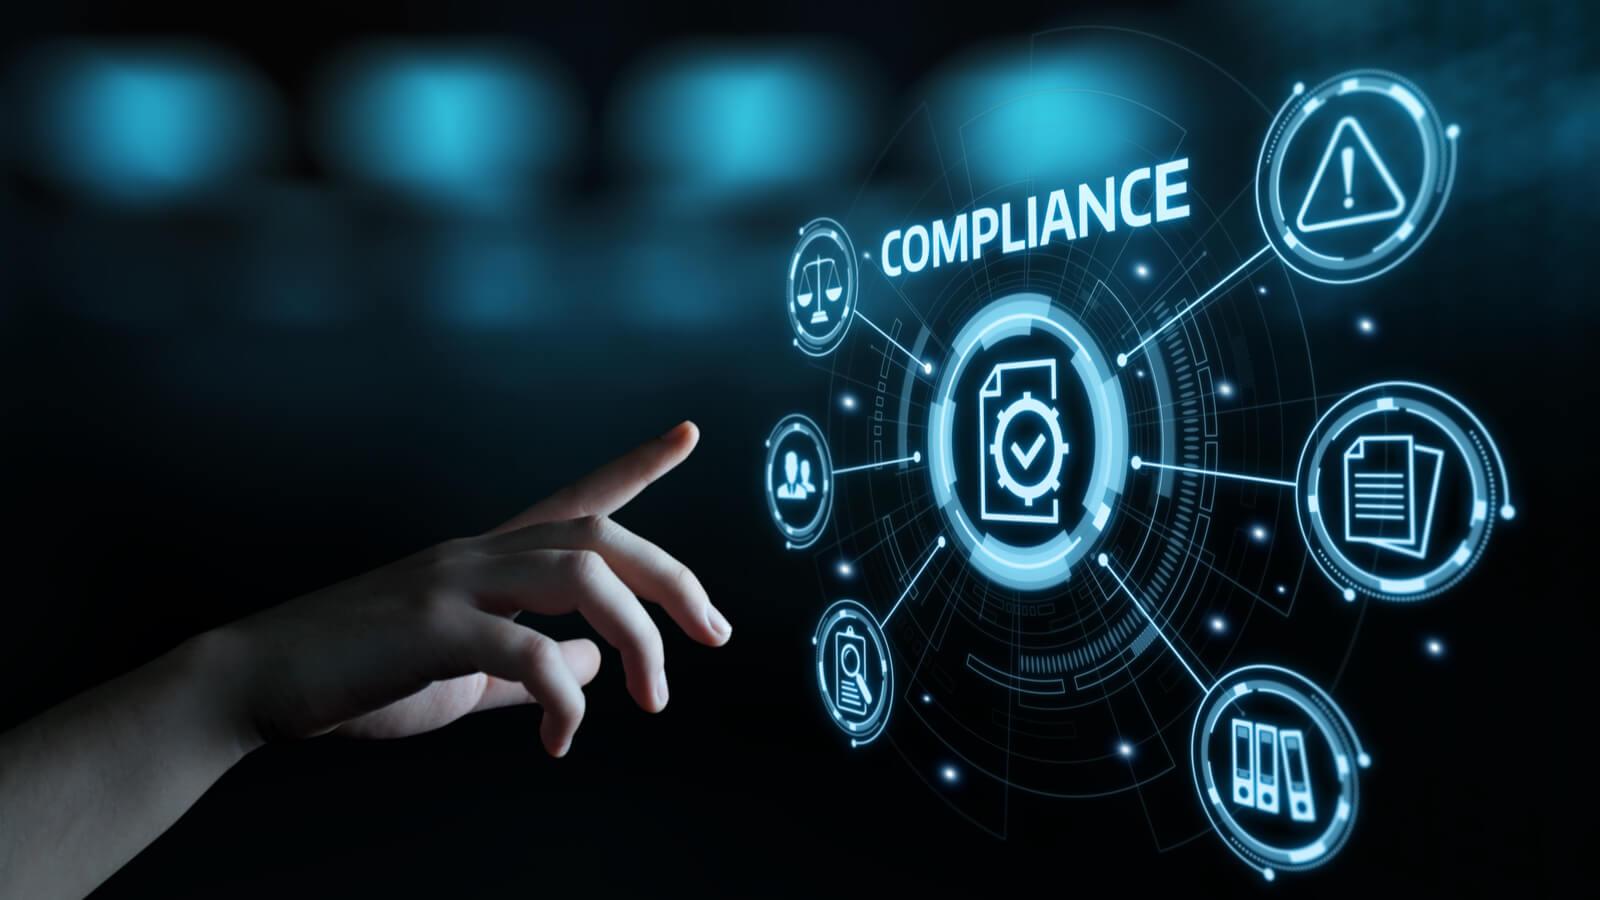 Compliance 4.0